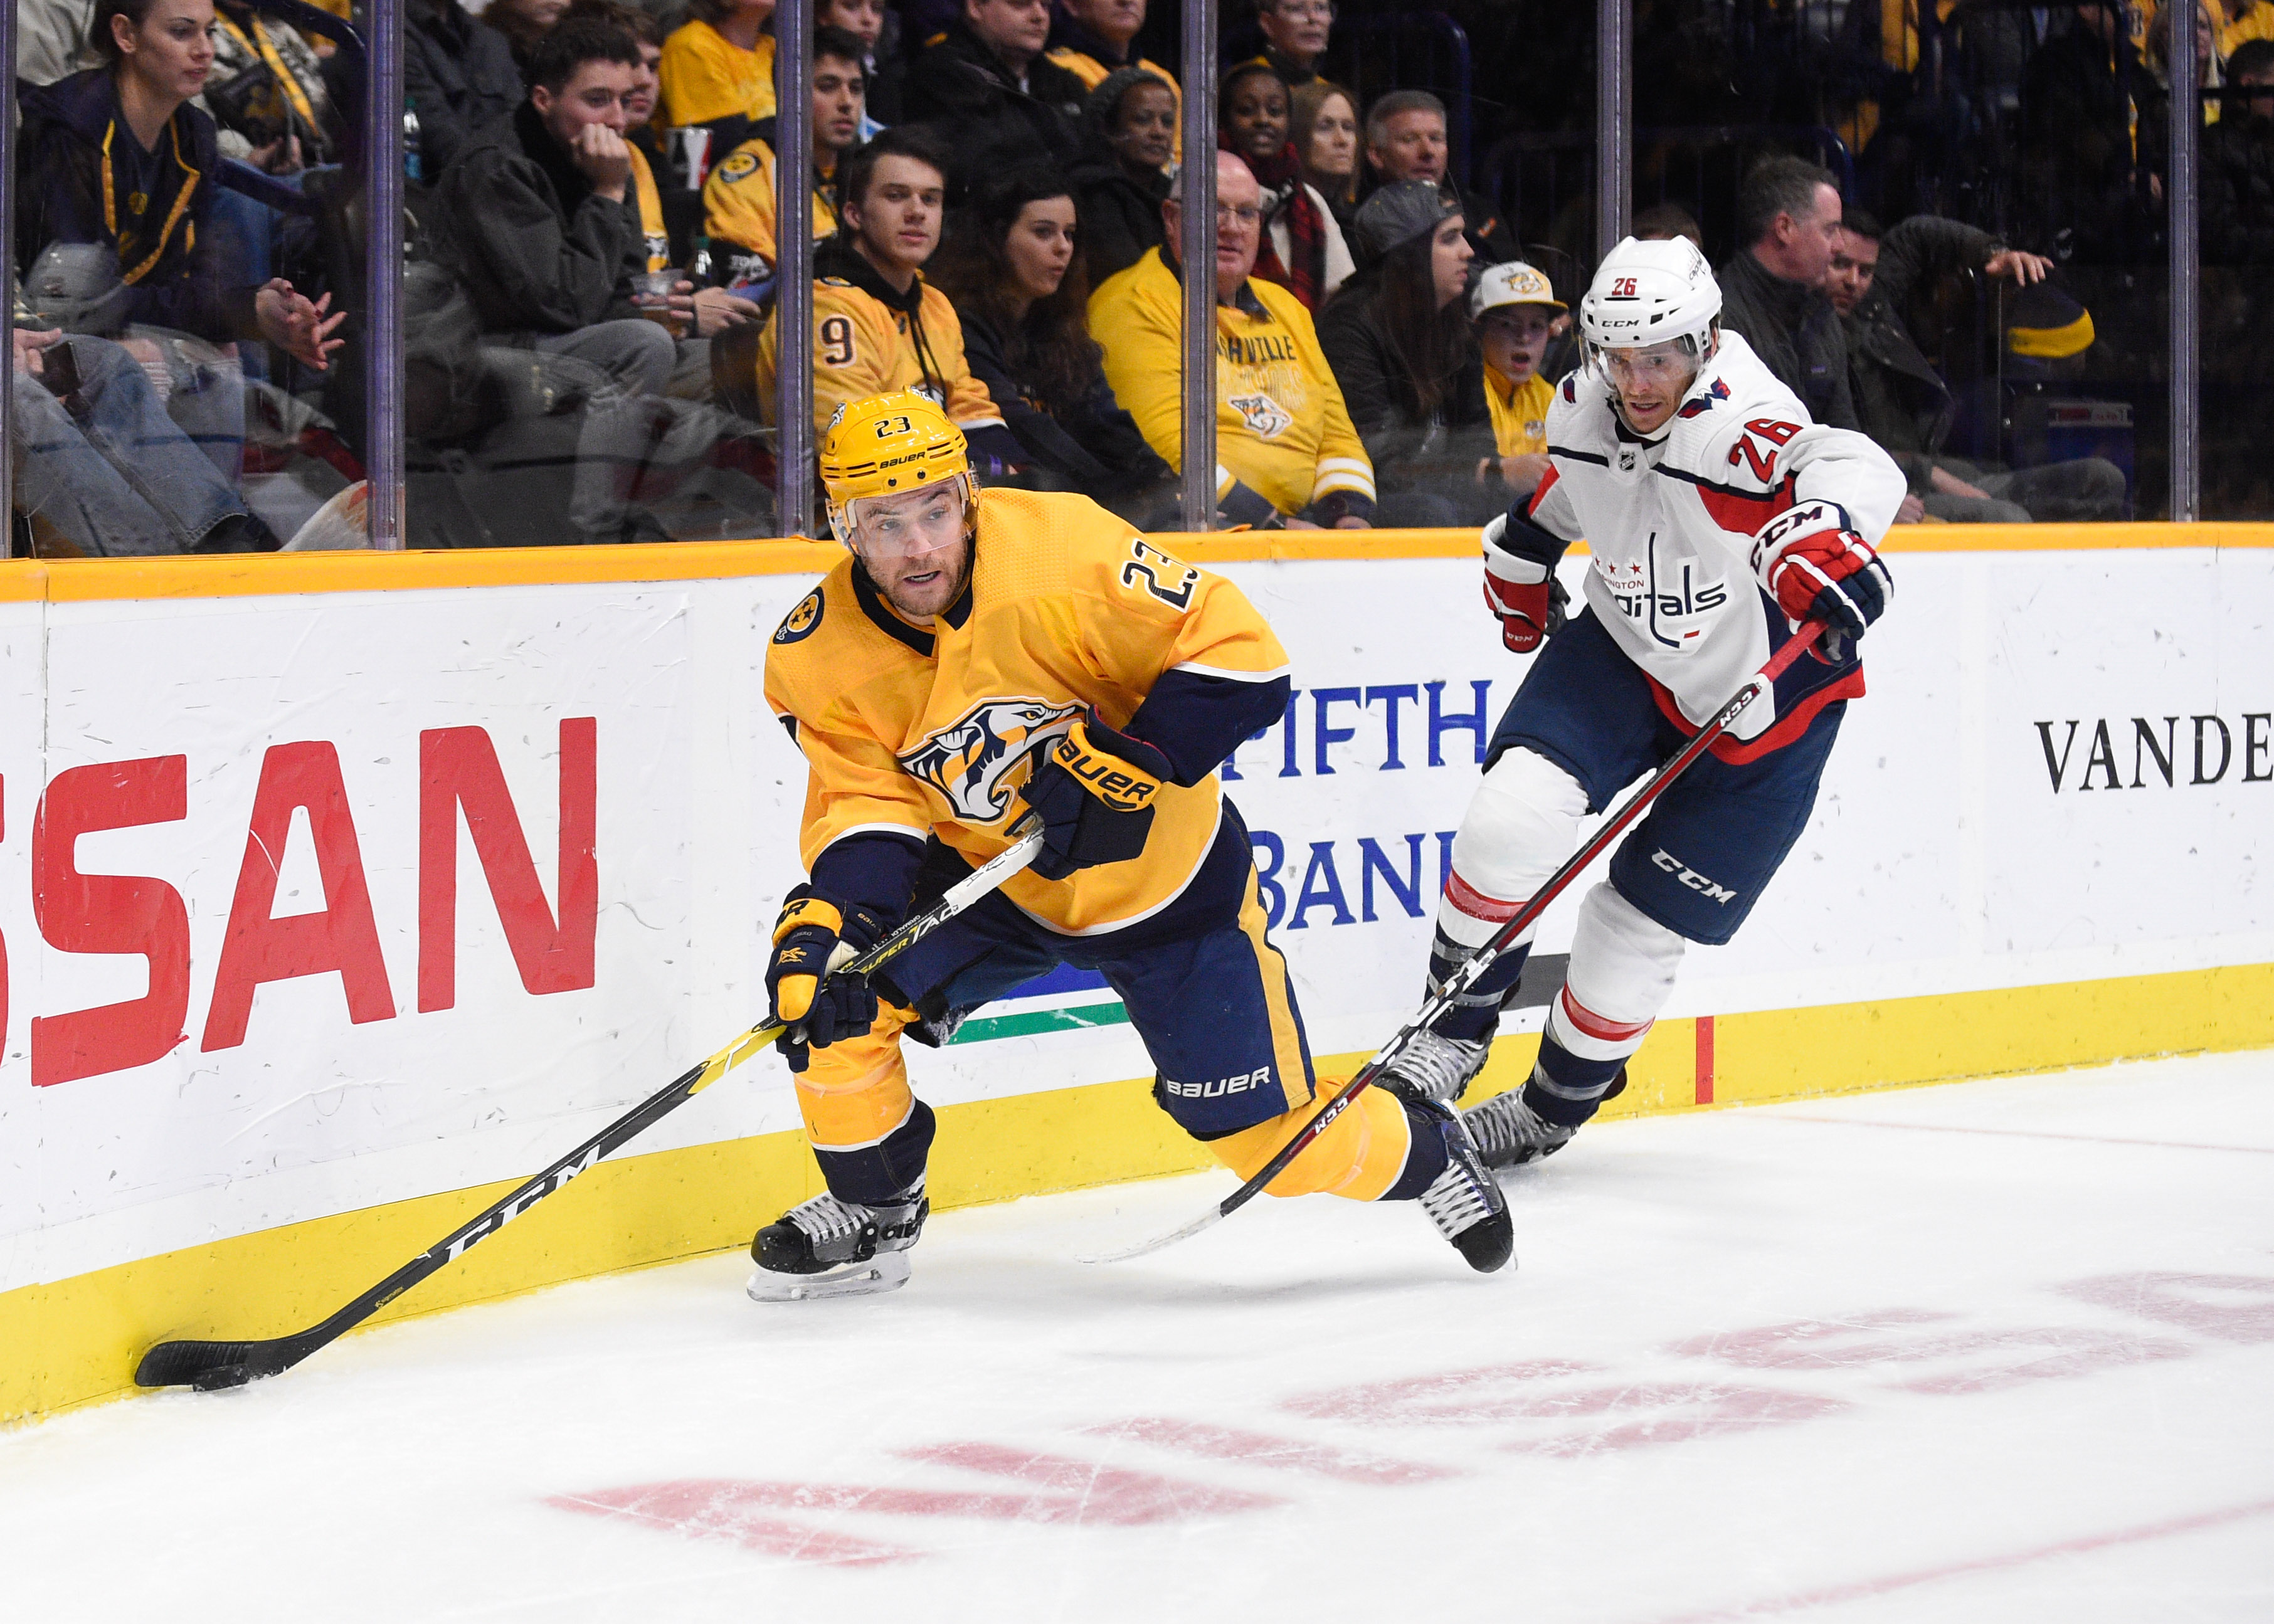 NHL: Washington Capitals at Nashville Predators